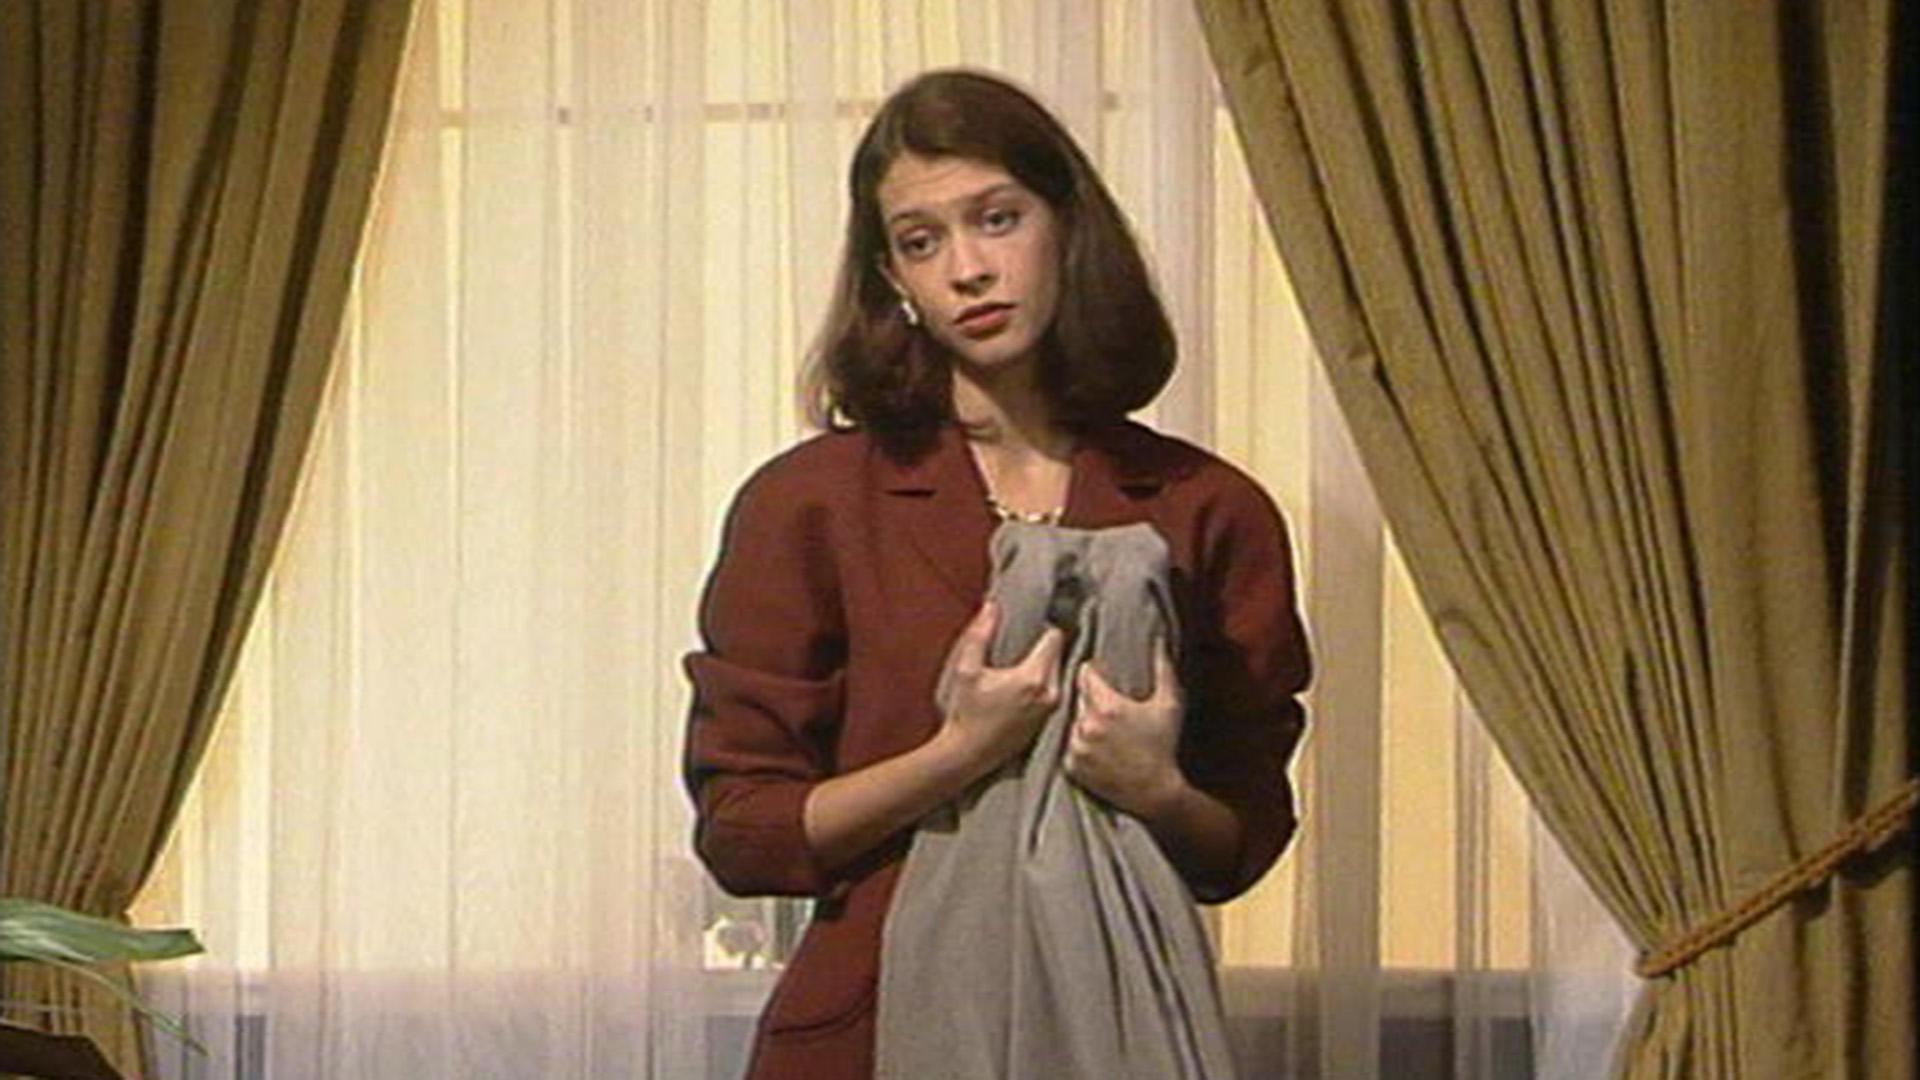 Tina fühlt sich unwohl in der Rolle als Hausfrau. | Folge 442